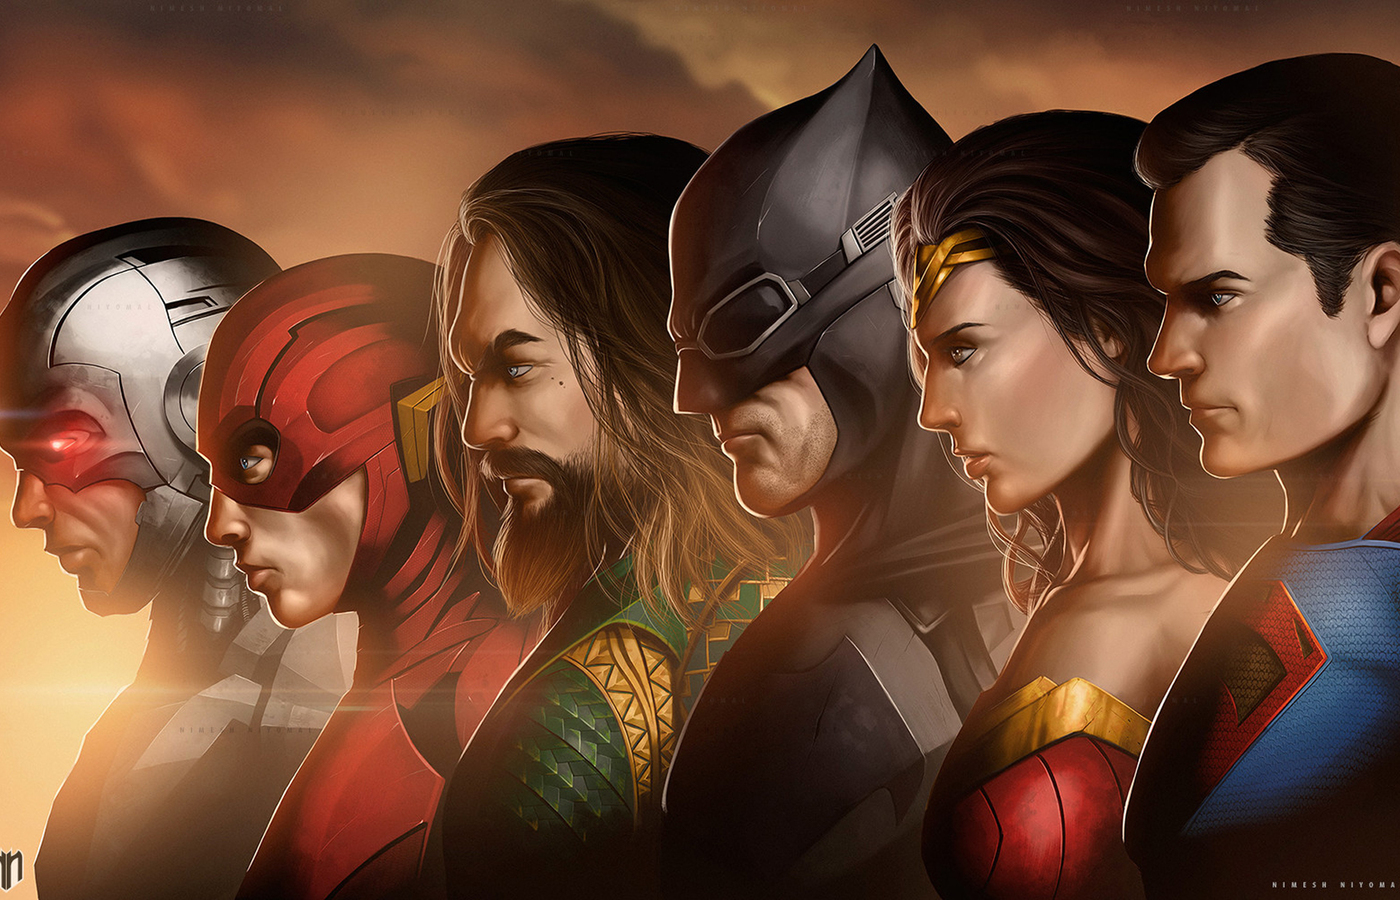 justice-league-movie-artwork-jg.jpg